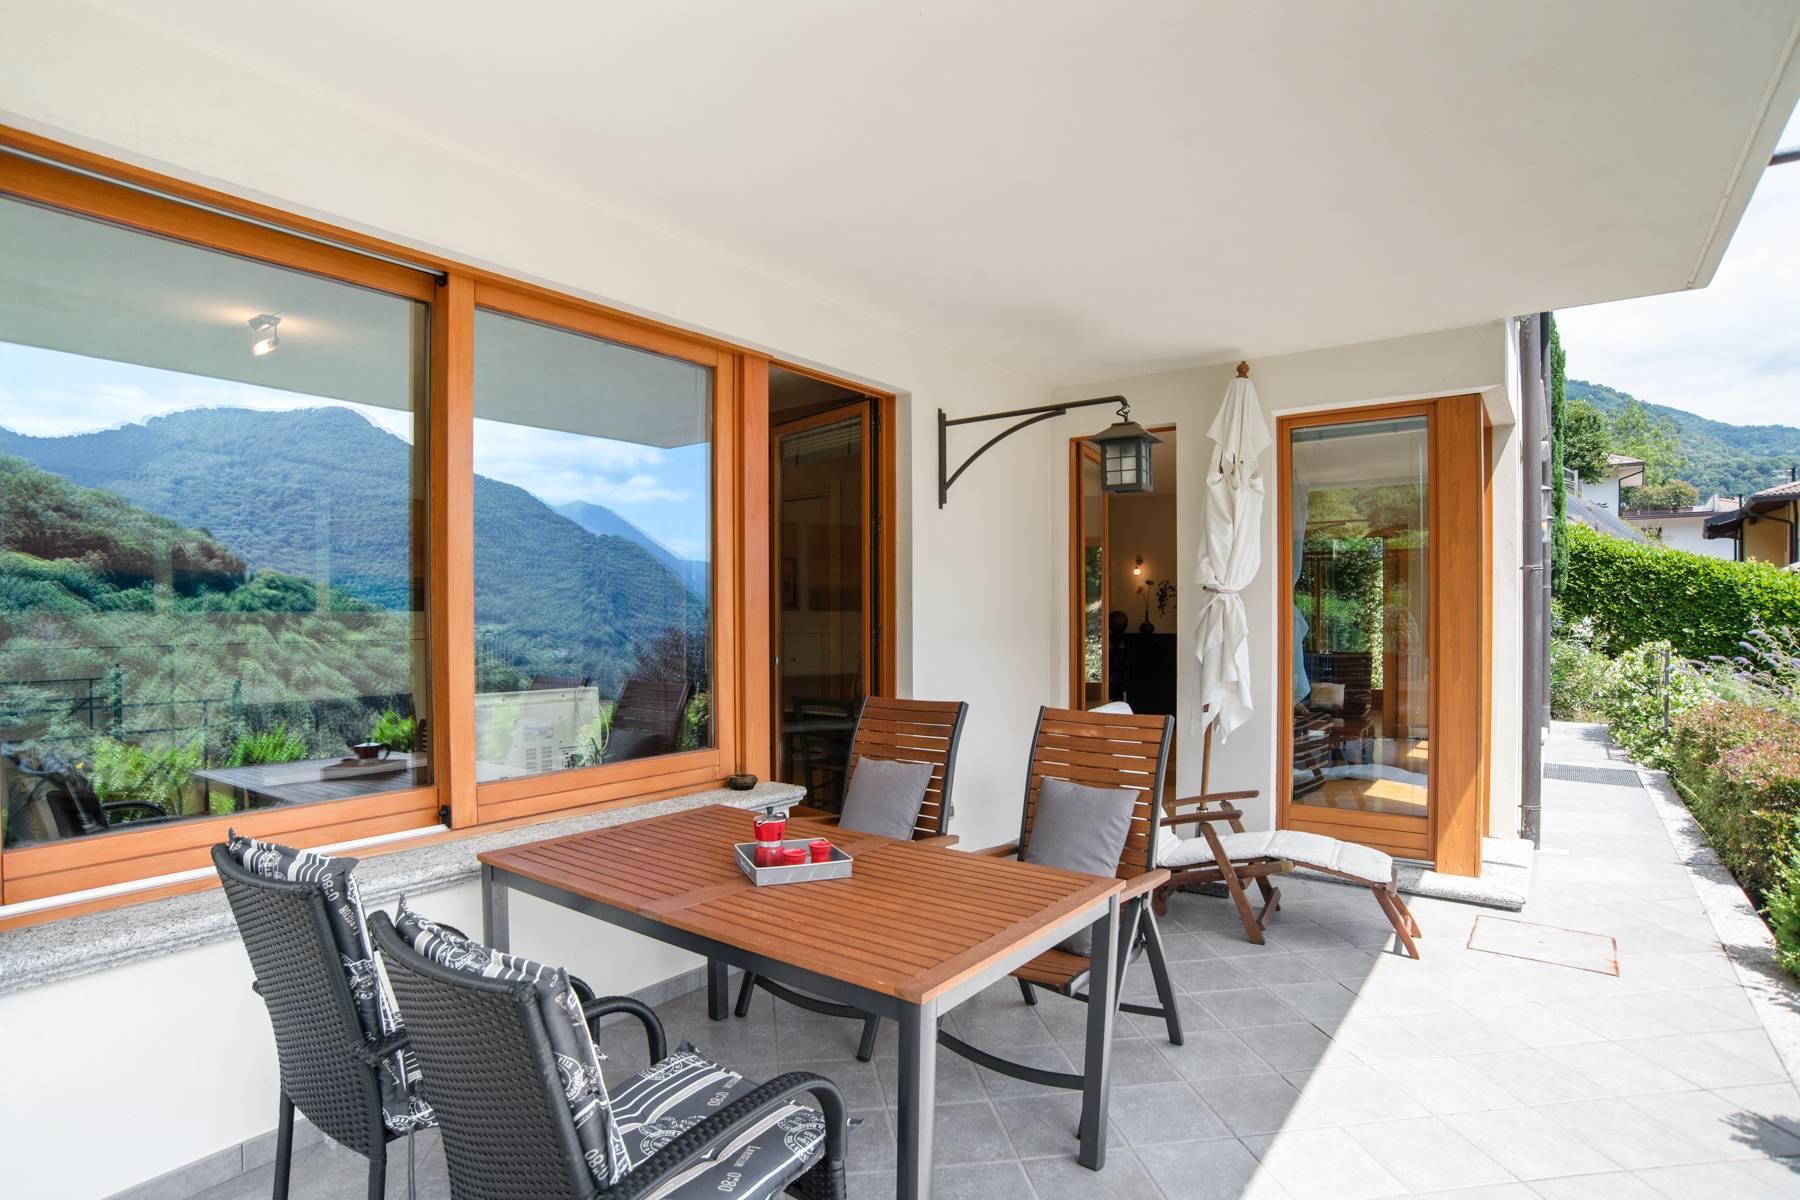 Splendida villa moderna sulla collina soleggiata sopra Argegno - 34